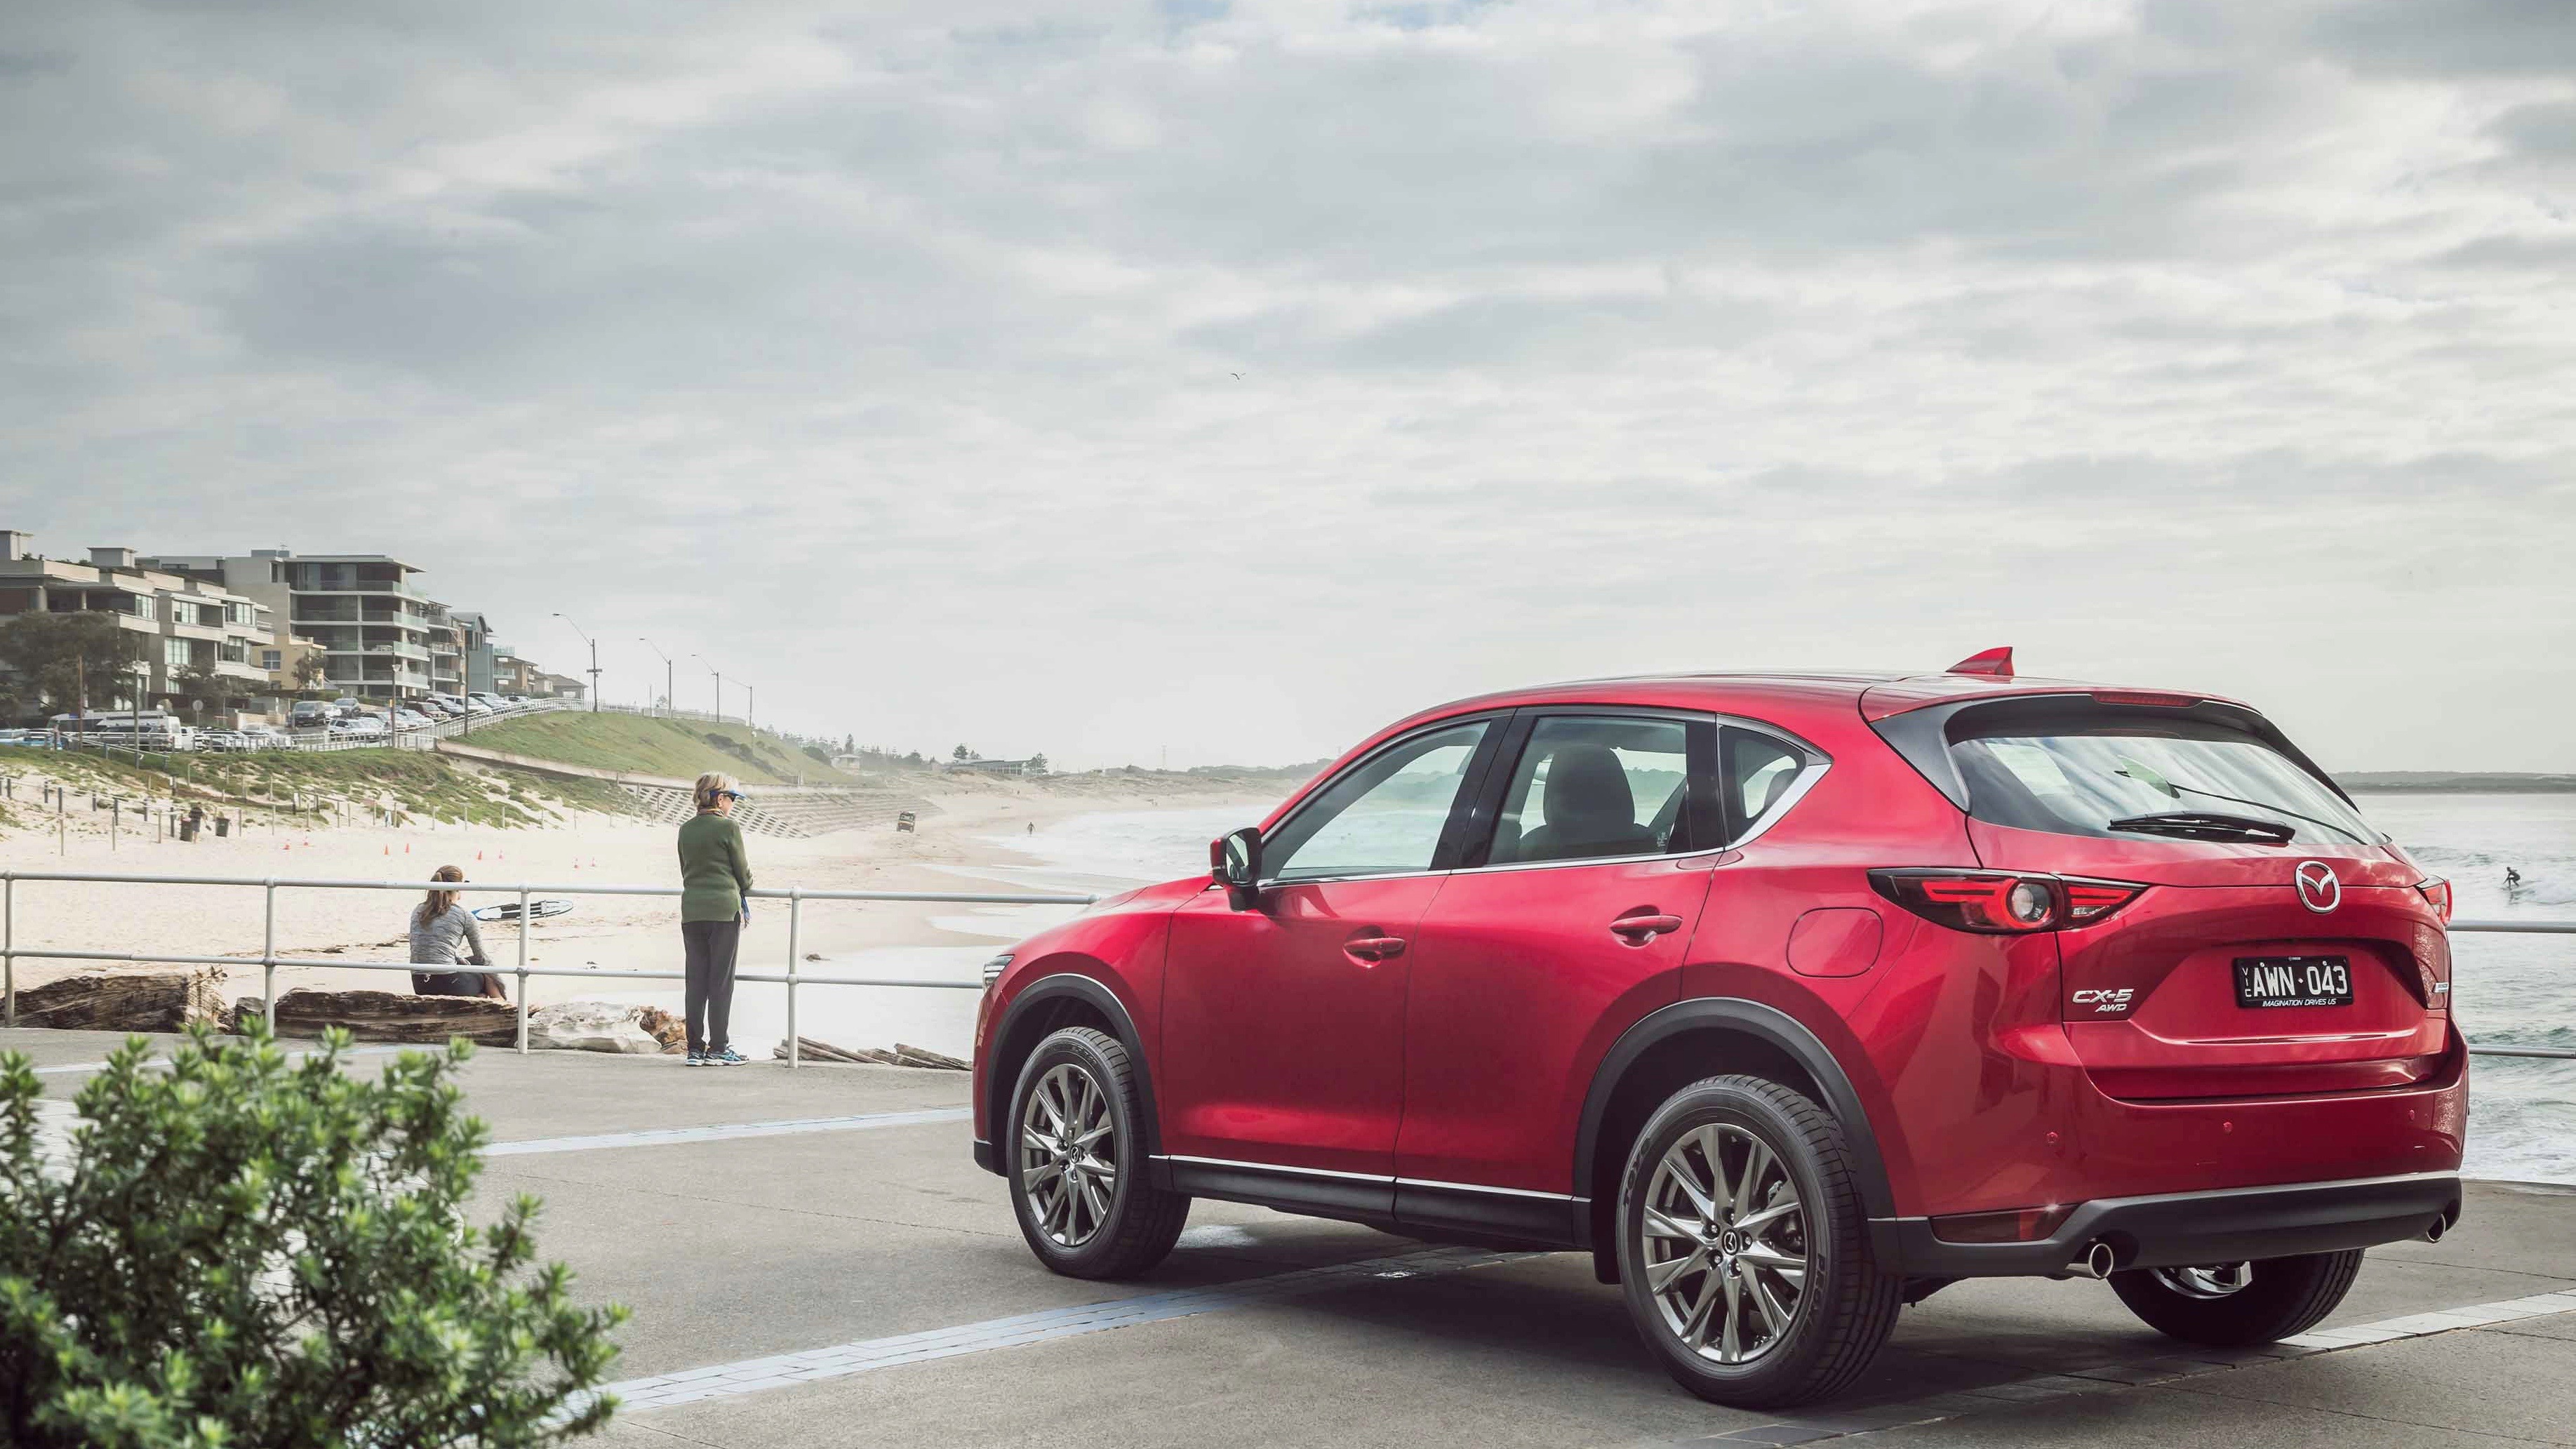 2019 Mazda CX-5 Akera Soul Red Crystal rear 3/4 close